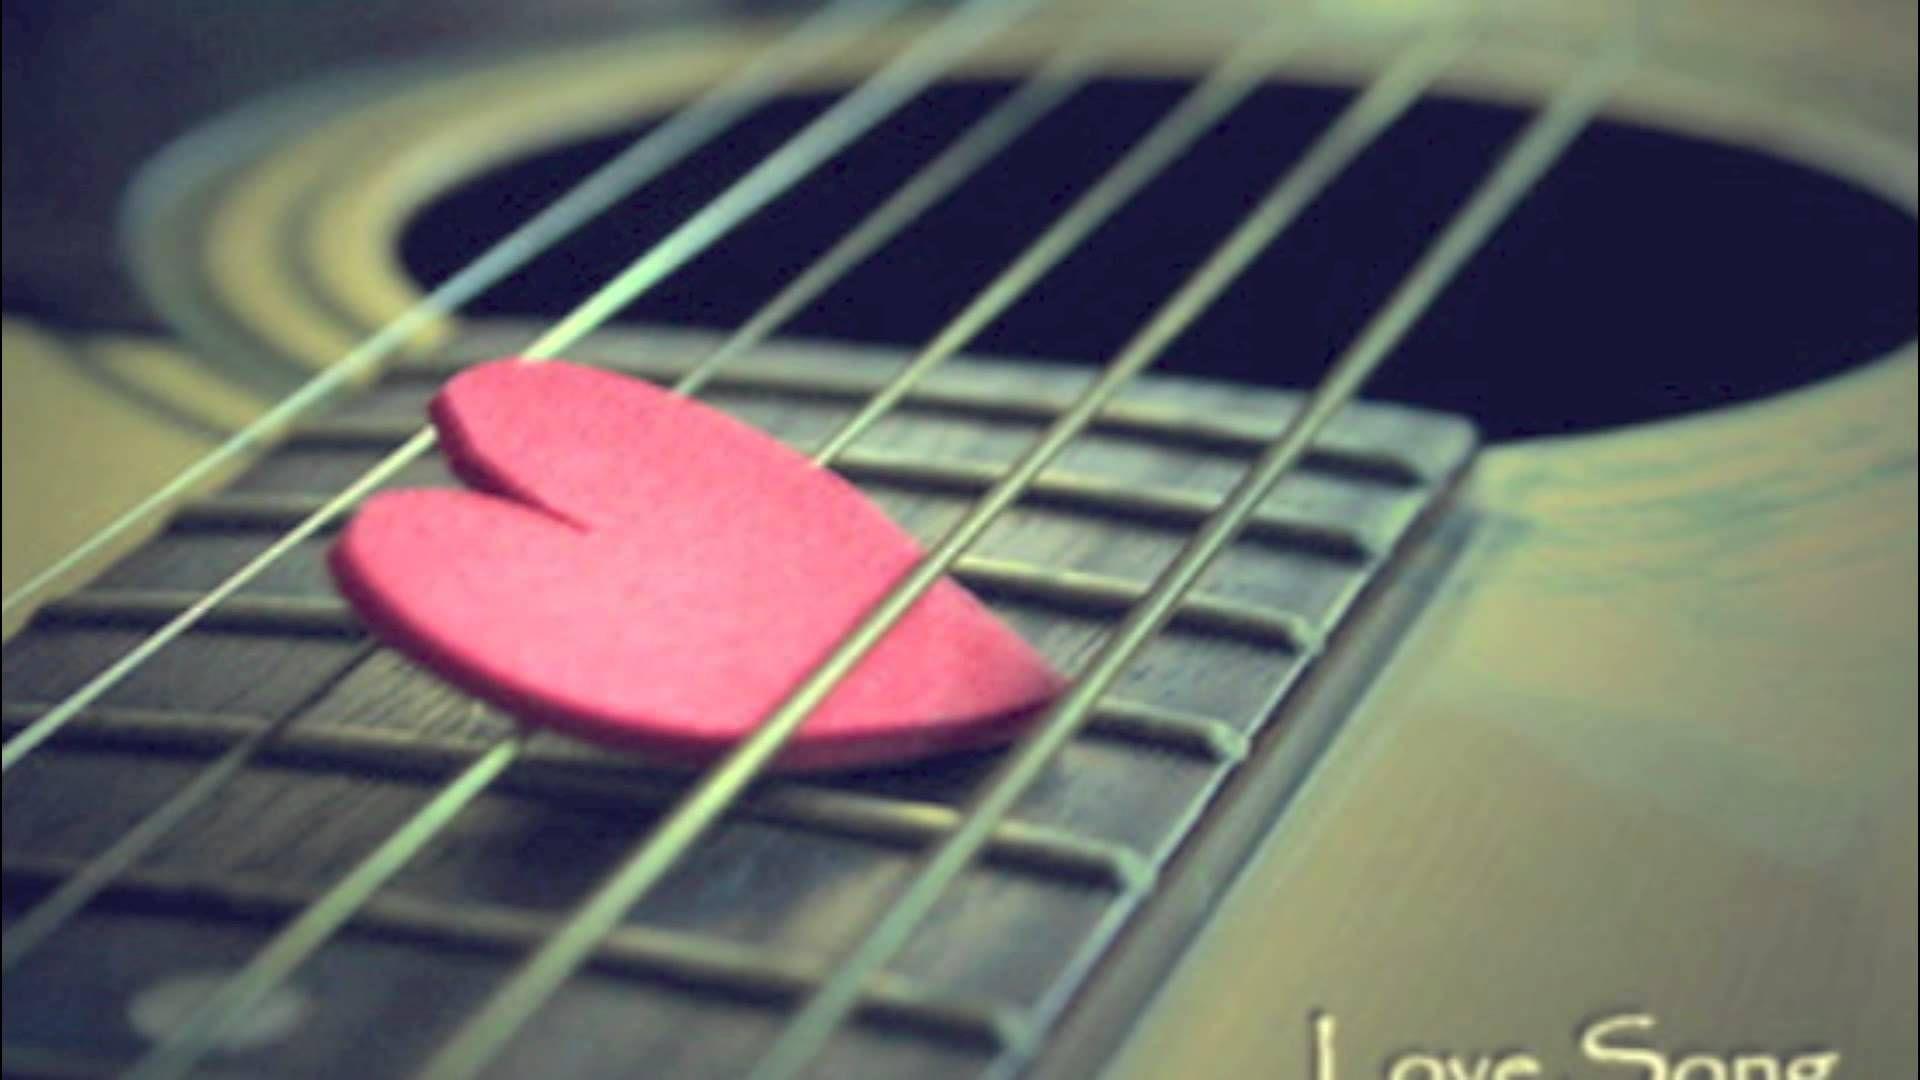 R B Guitar Instrumental Beat All I Need Instrumental Beats Guitar Pop